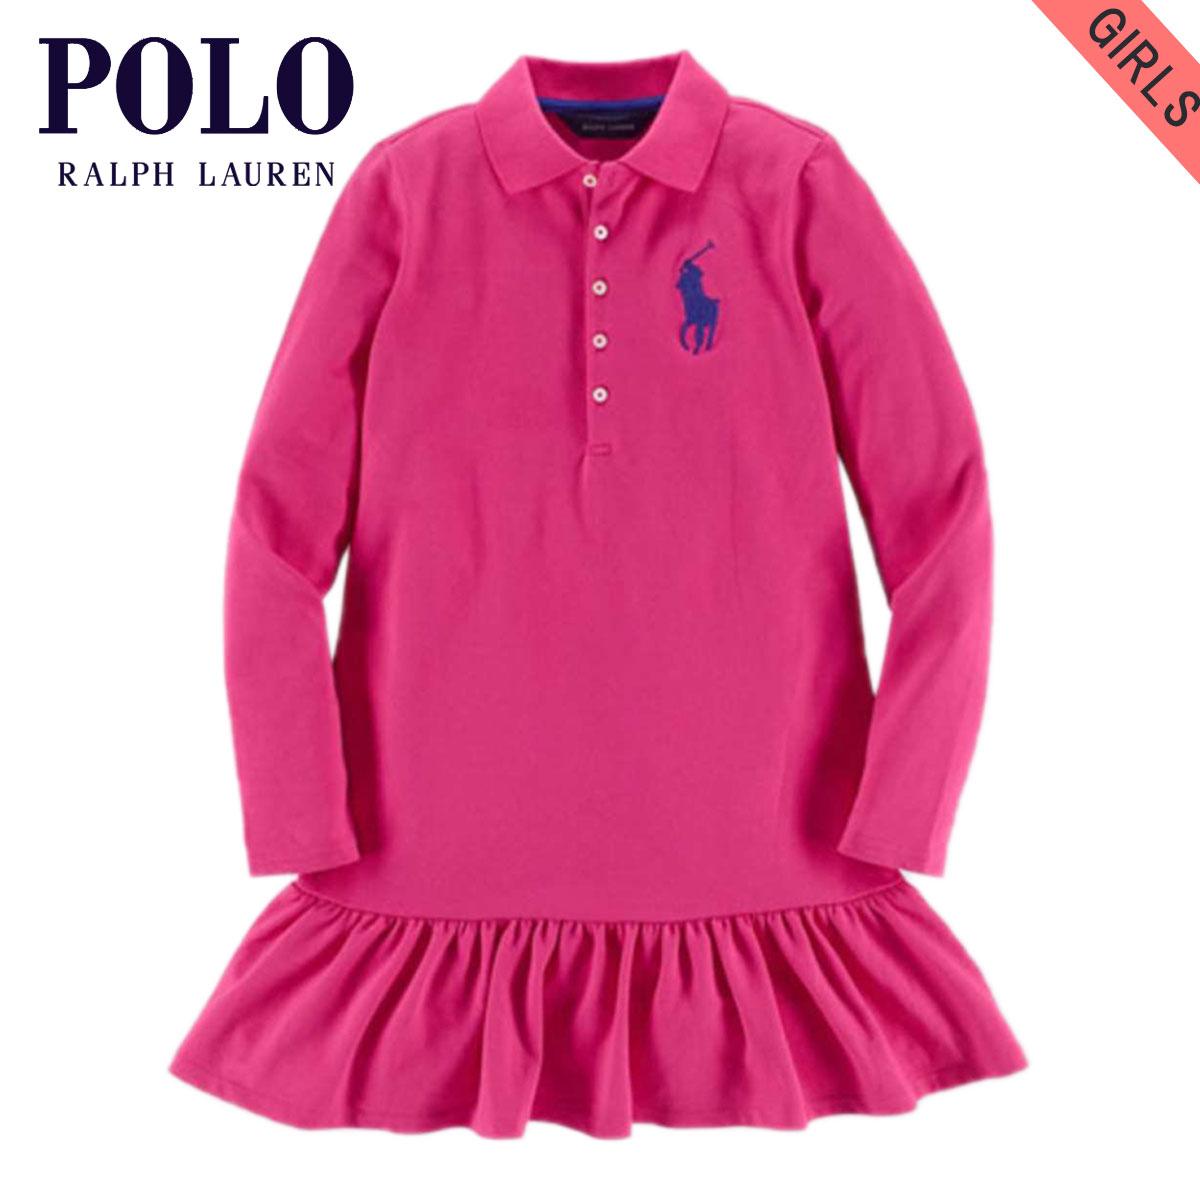 1f790a55 Poloralflorenkids POLO RALPH LAUREN CHILDREN genuine kids clothing girls polo  shirt BIG PONY COTTON DRESS 40925606